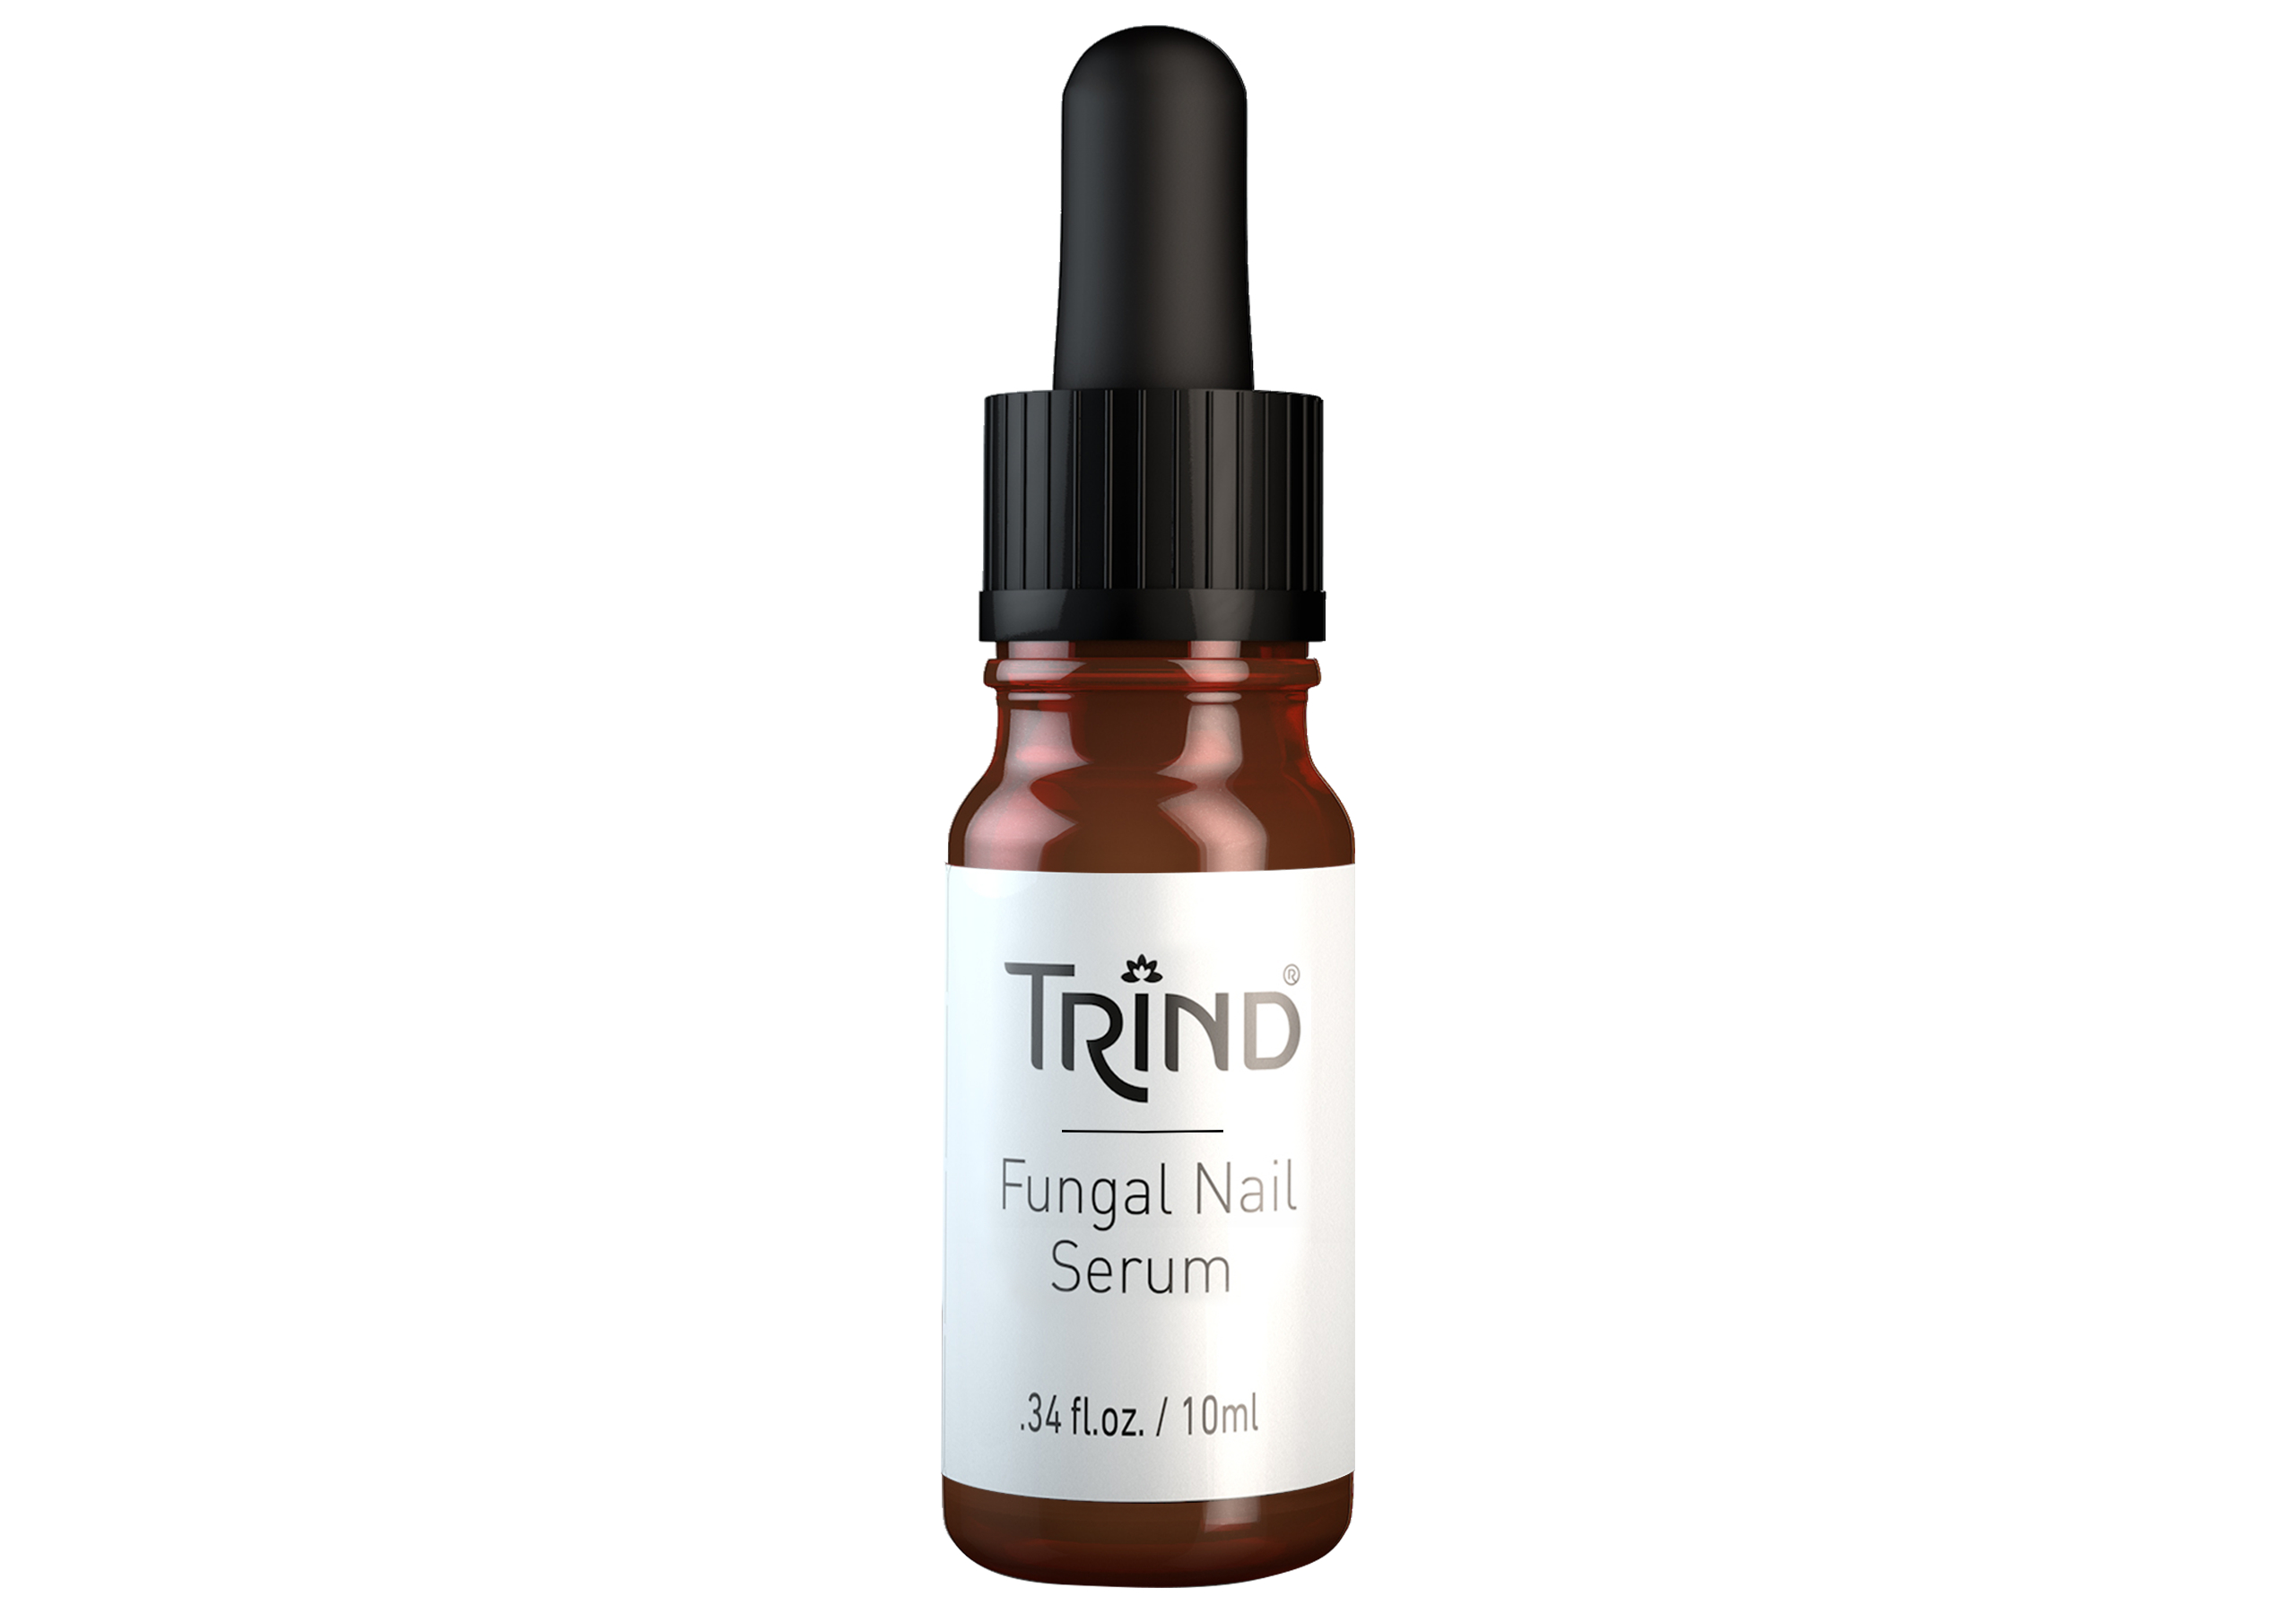 Trind Nagelverzorging Fungal Nail serum